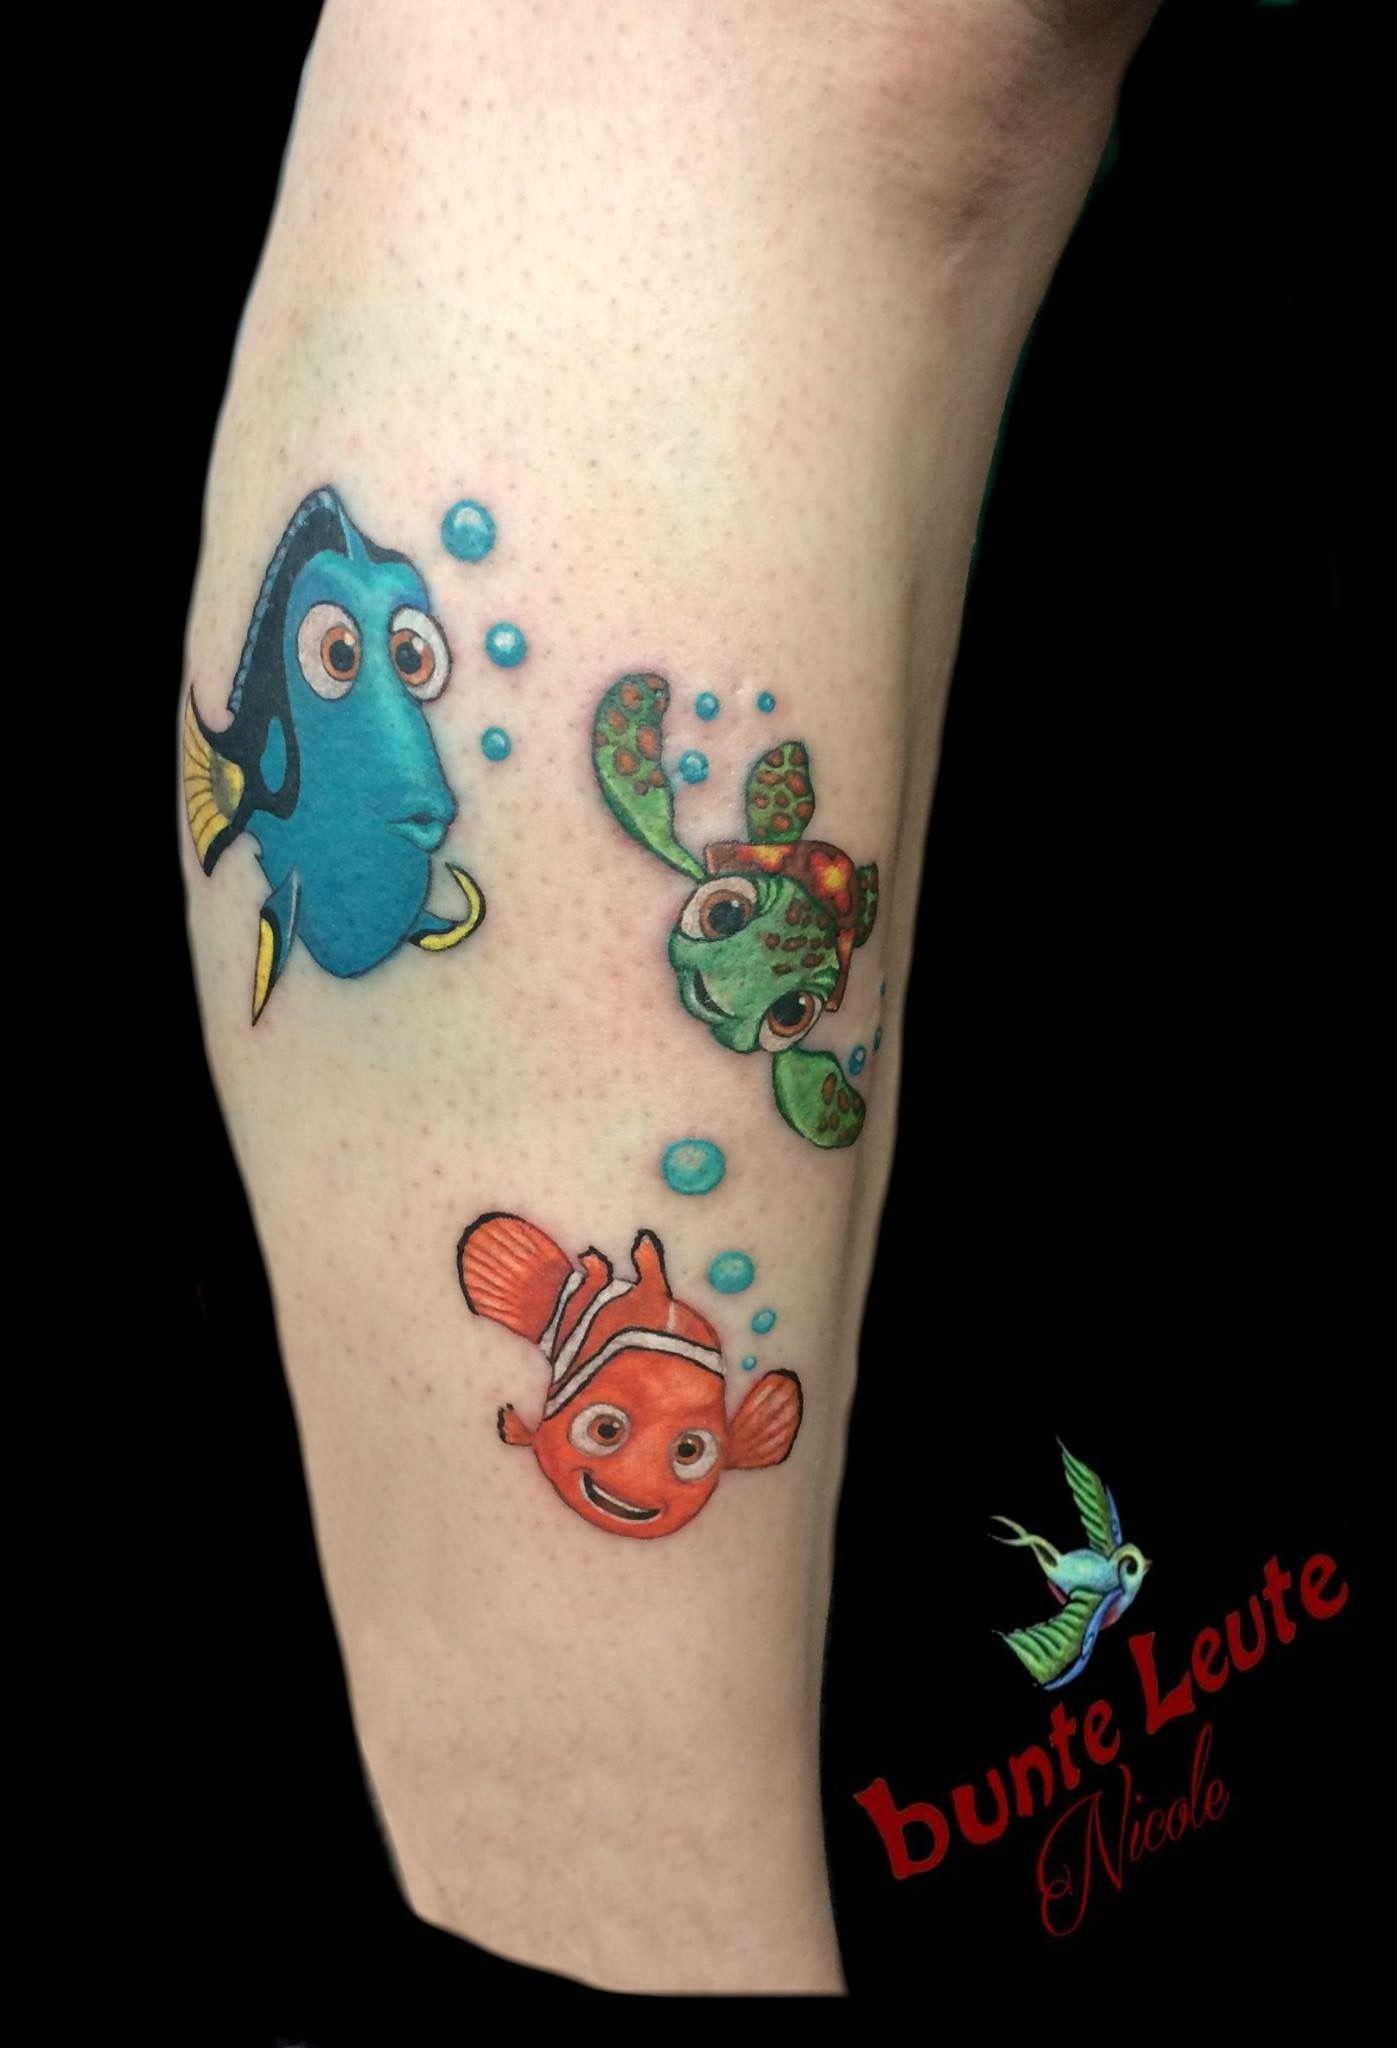 Findet Nemo Dori Tattoo | bunte Leute Tattoo Art | Pinterest | Leute ...